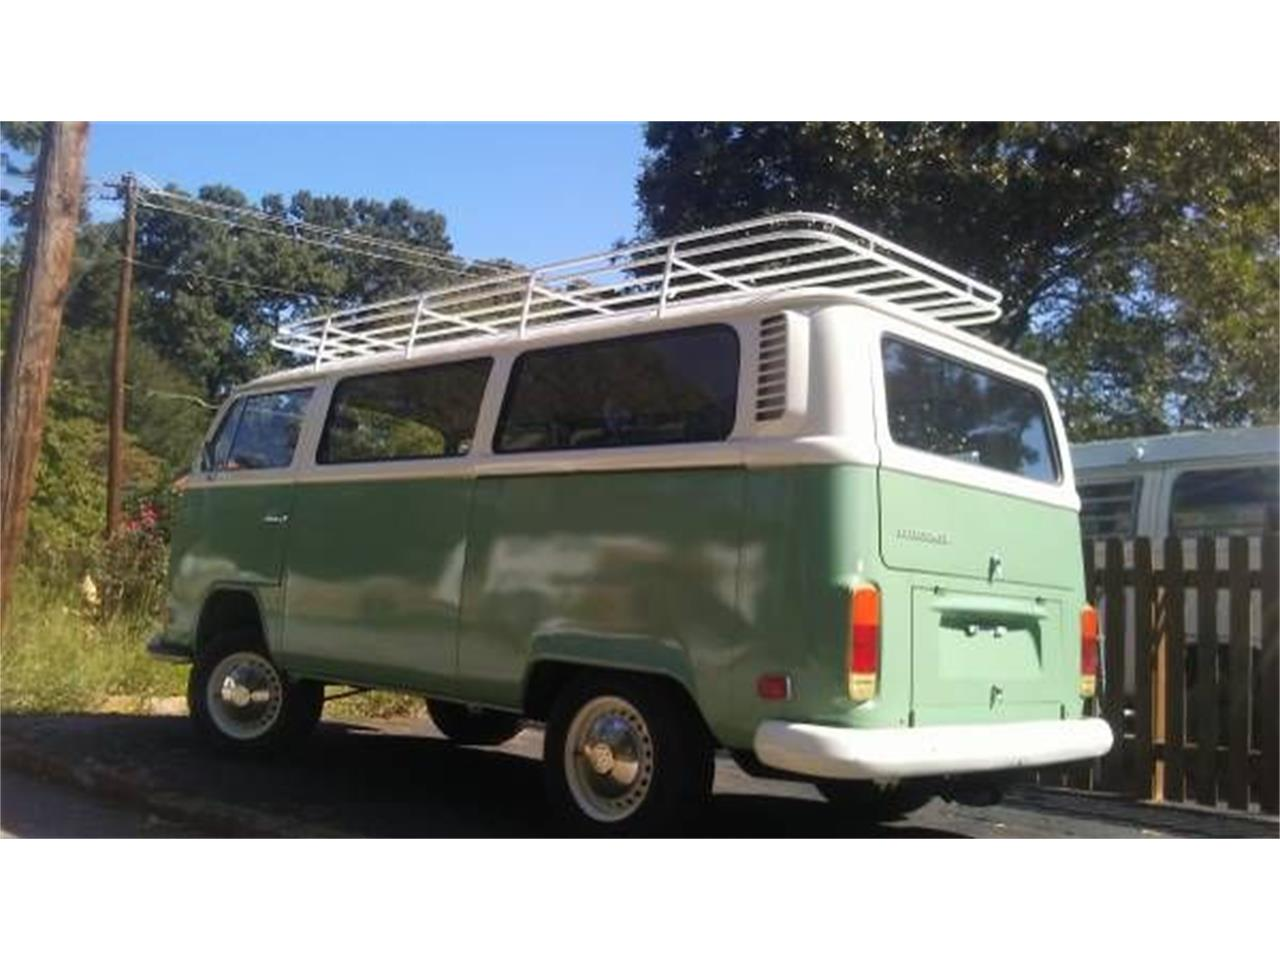 For Sale: 1972 Volkswagen Bus in Cadillac, Michigan